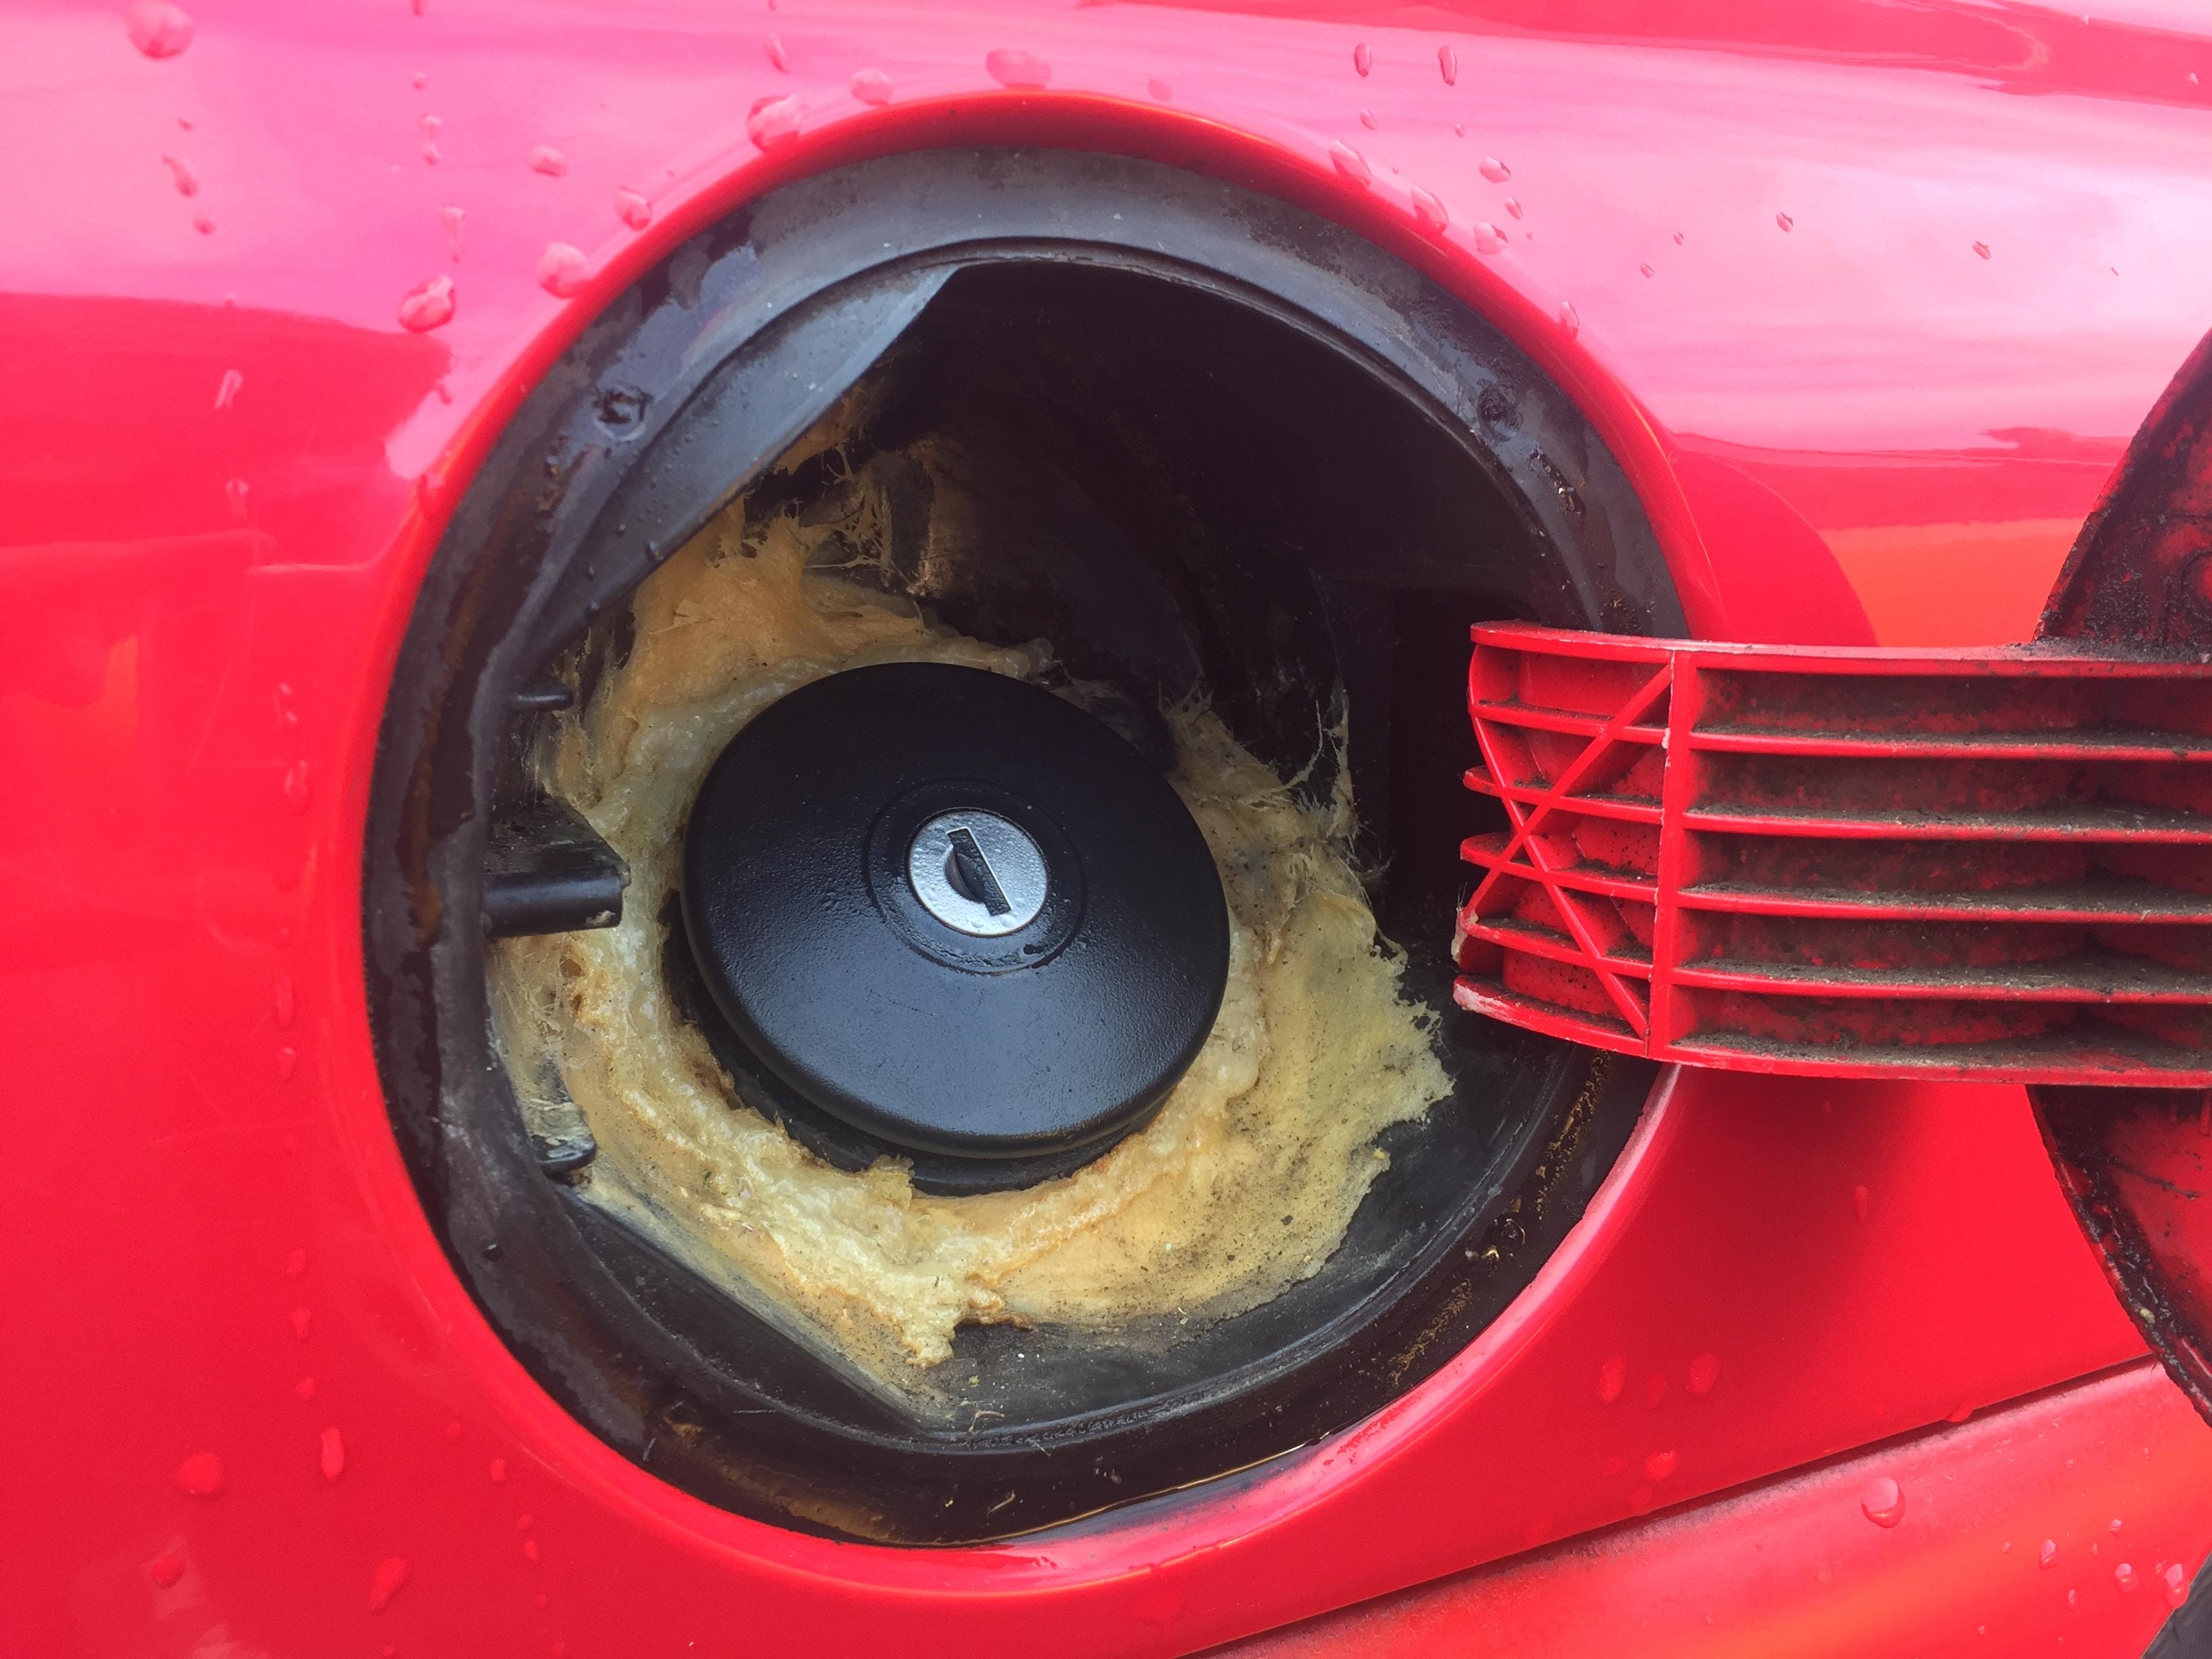 Ford Escort GTi, Escort GTi, Ford Escort, Escort, Ford, hot hatch, performance ford, pf mag, pf magazine, project car, classic car, retro car, car fail, autotrader, ebay, ebay motors, expanding foam